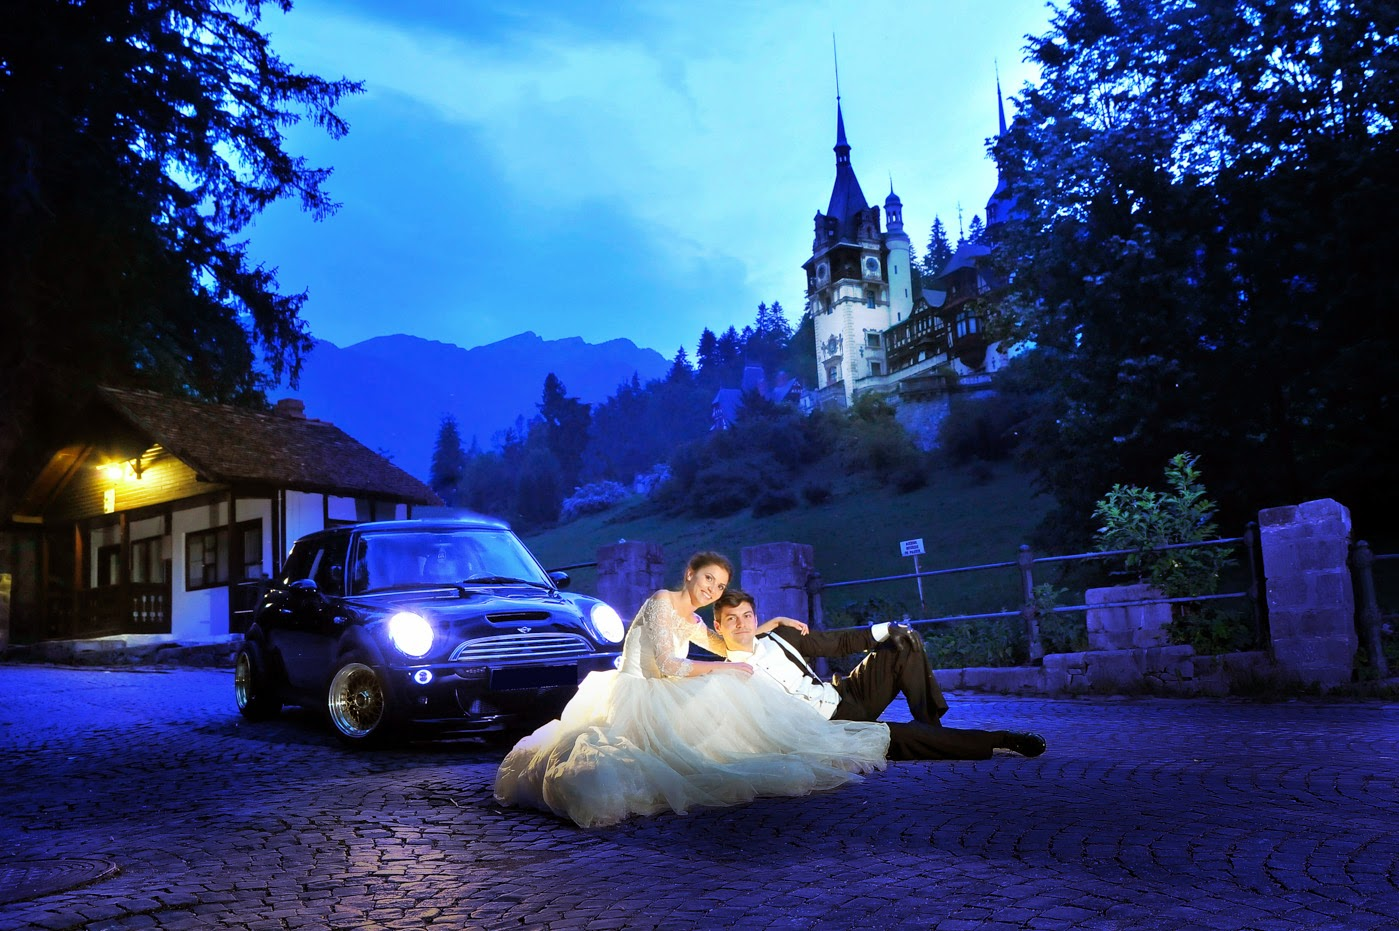 Wedding Photography at Peles Castle, Romania